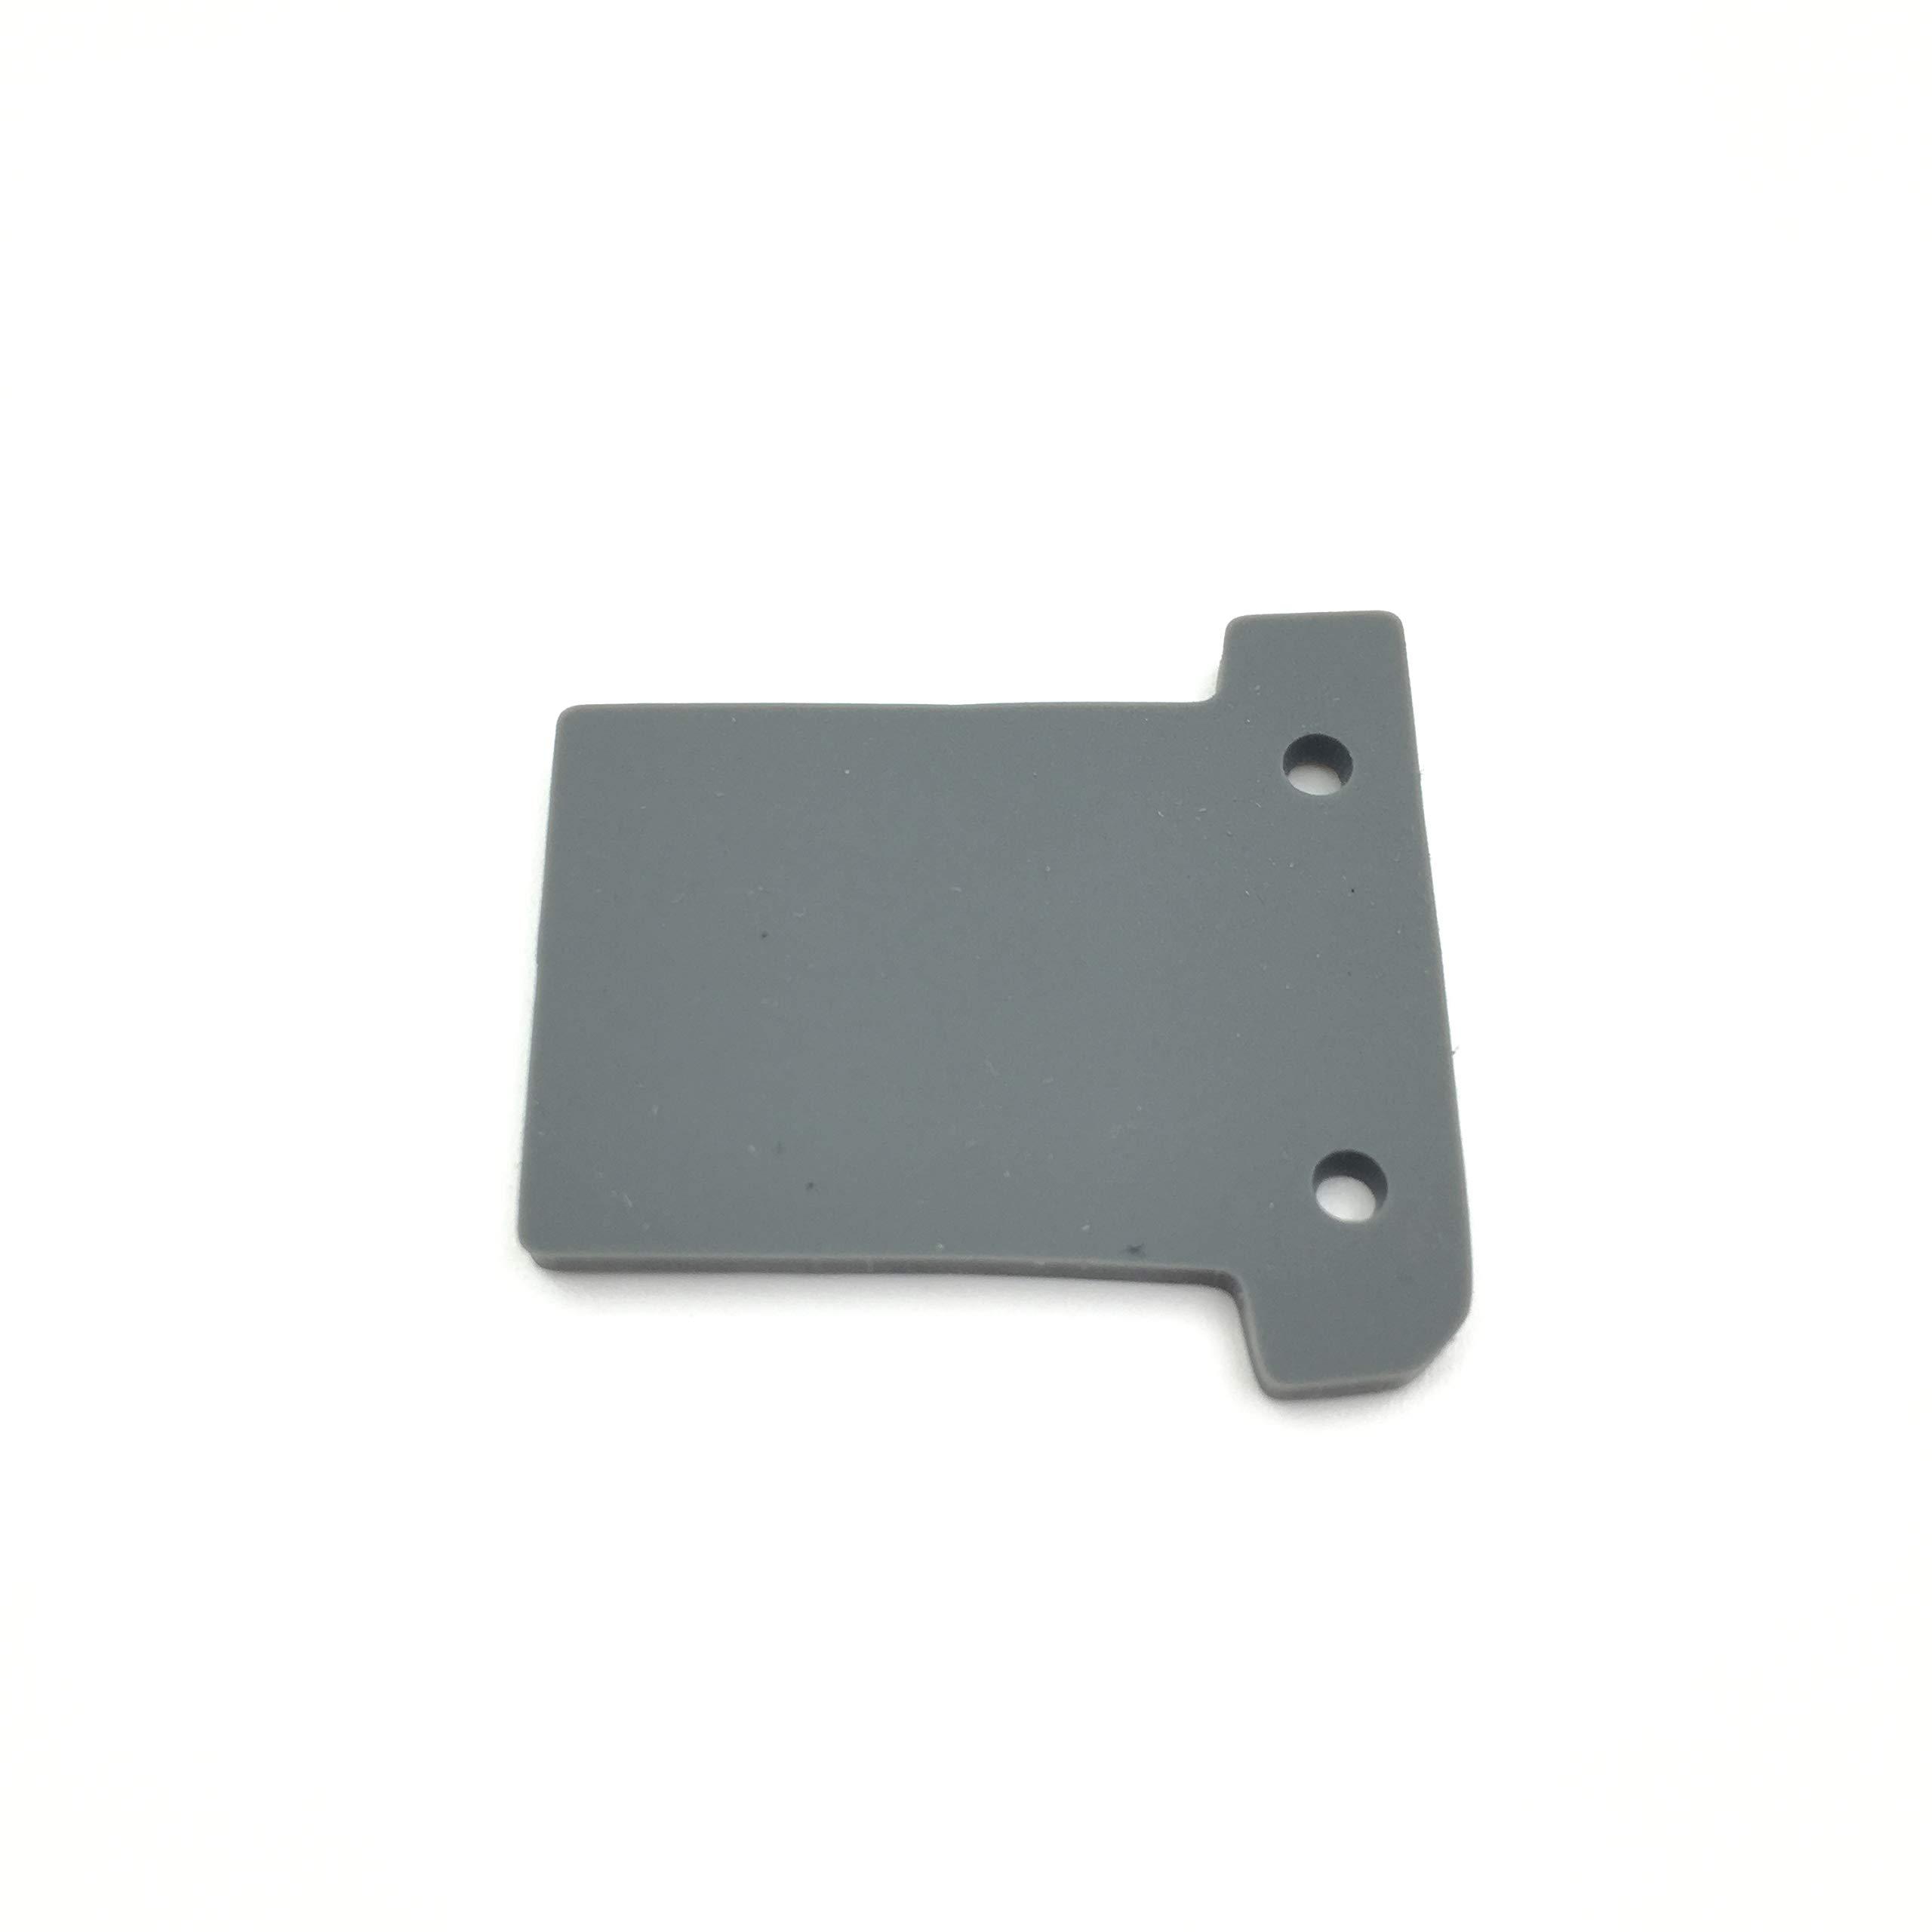 OKLILI 10PC X 174-7849 162-3362 Feed Feeder Module Separation Pad for Kodak i30 i40 i50 i55 i60 i65 i80